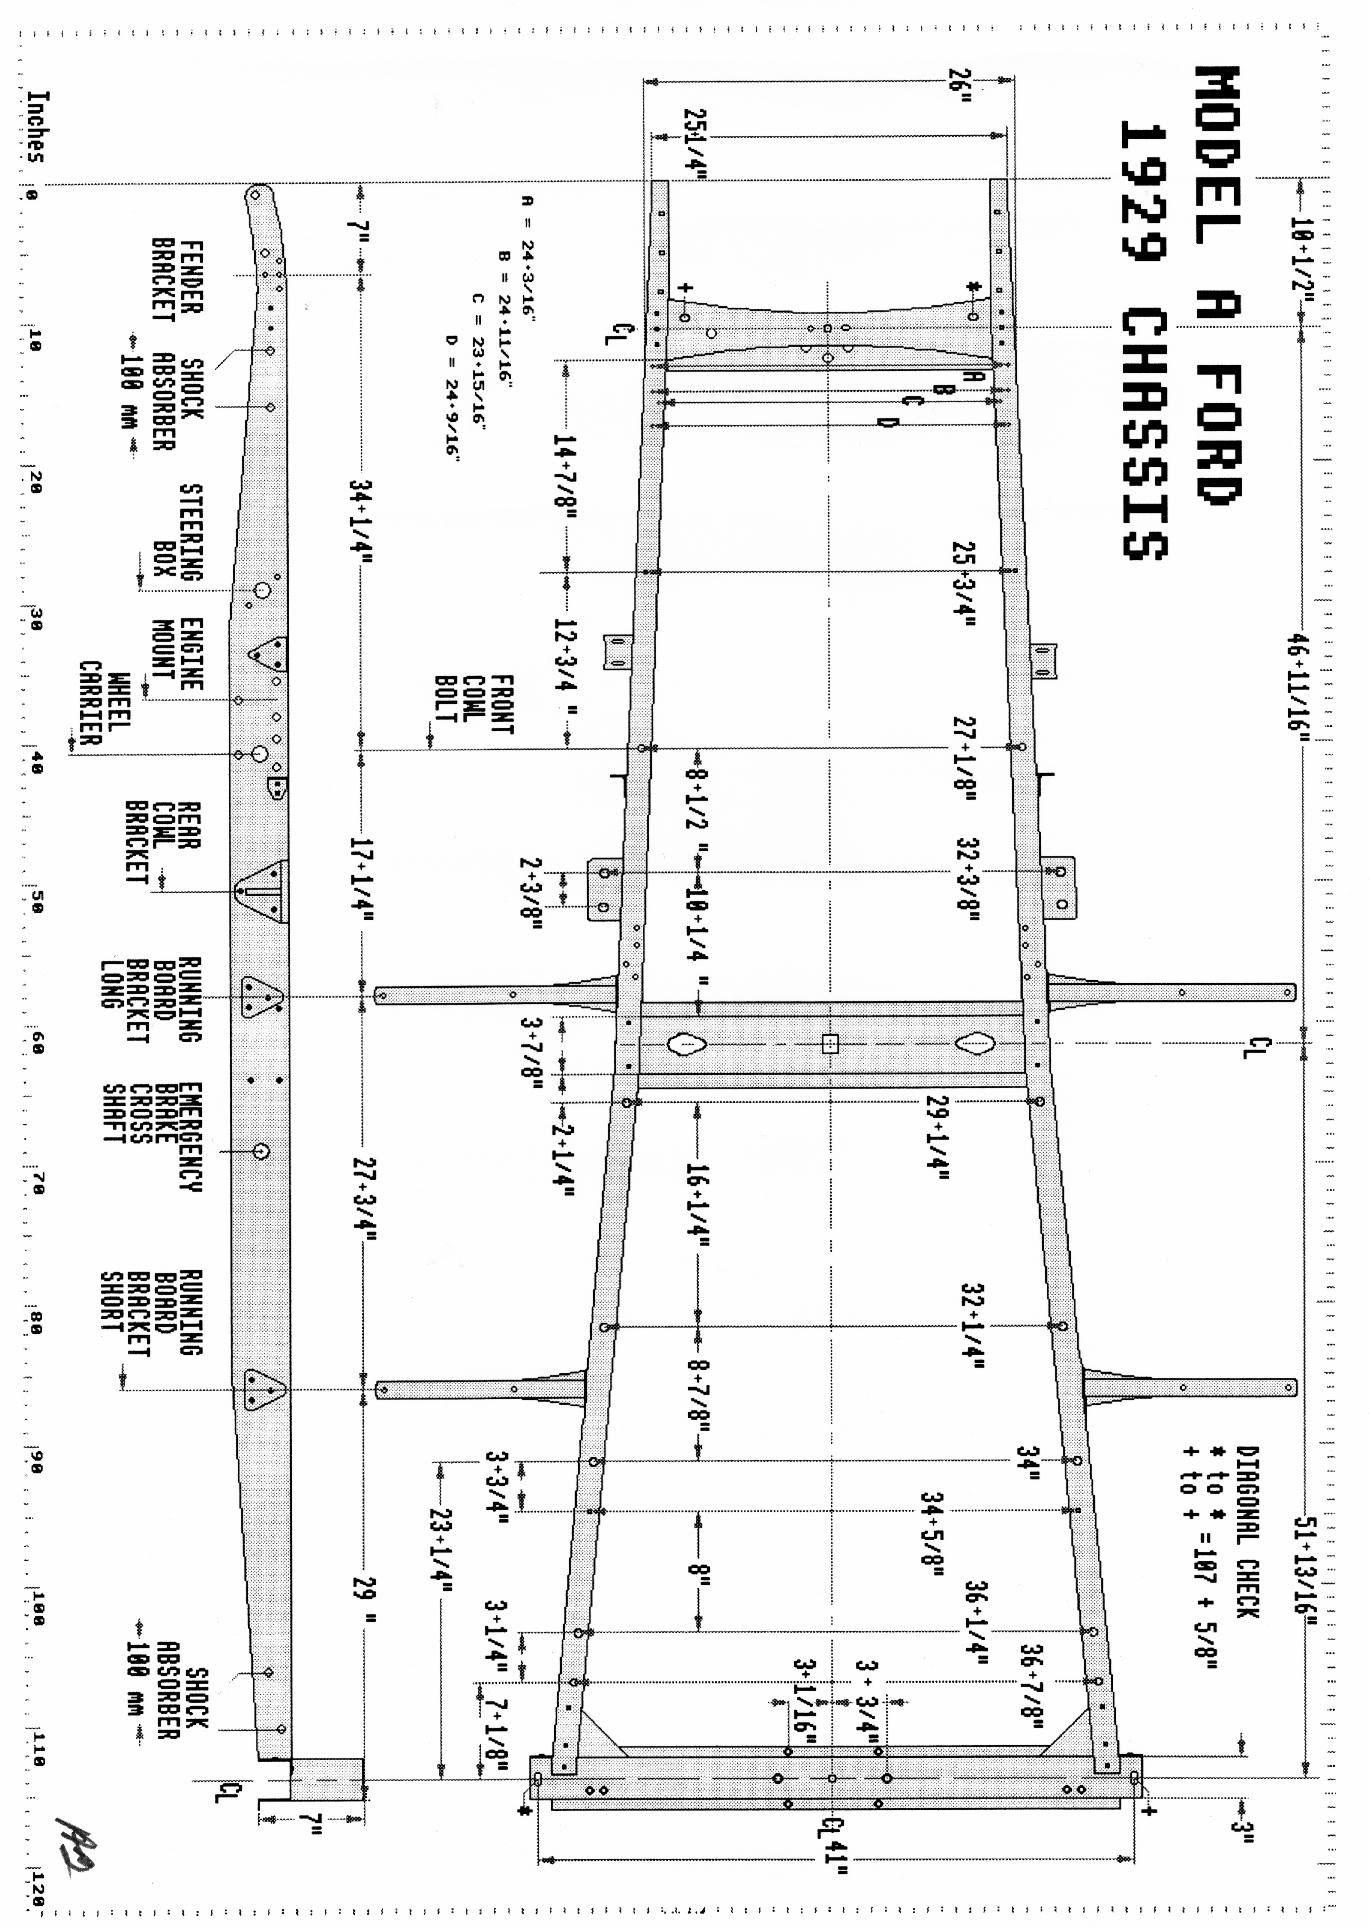 1928 ford model a wiring diagram